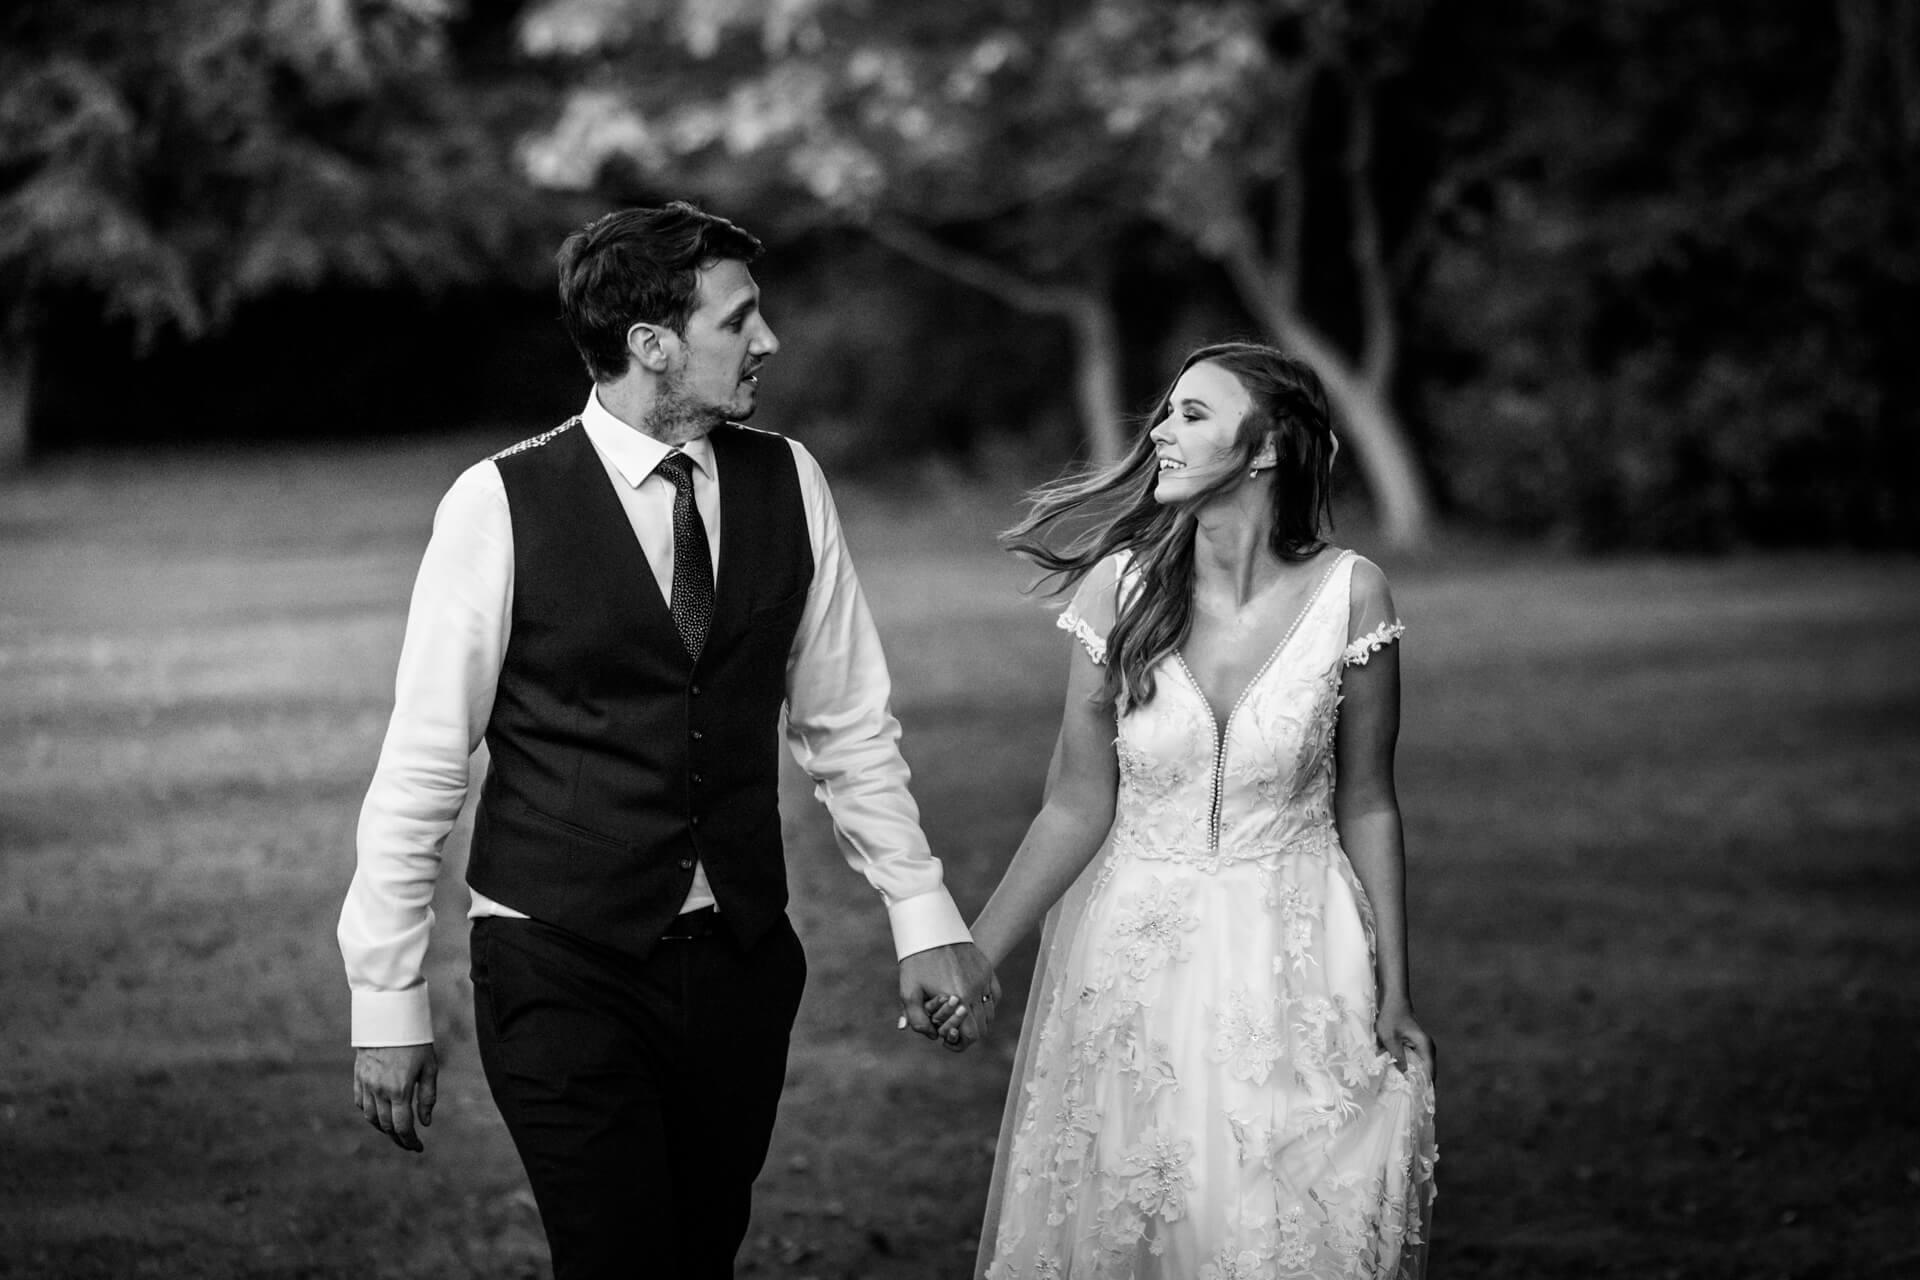 wedding couple walking in some gardens